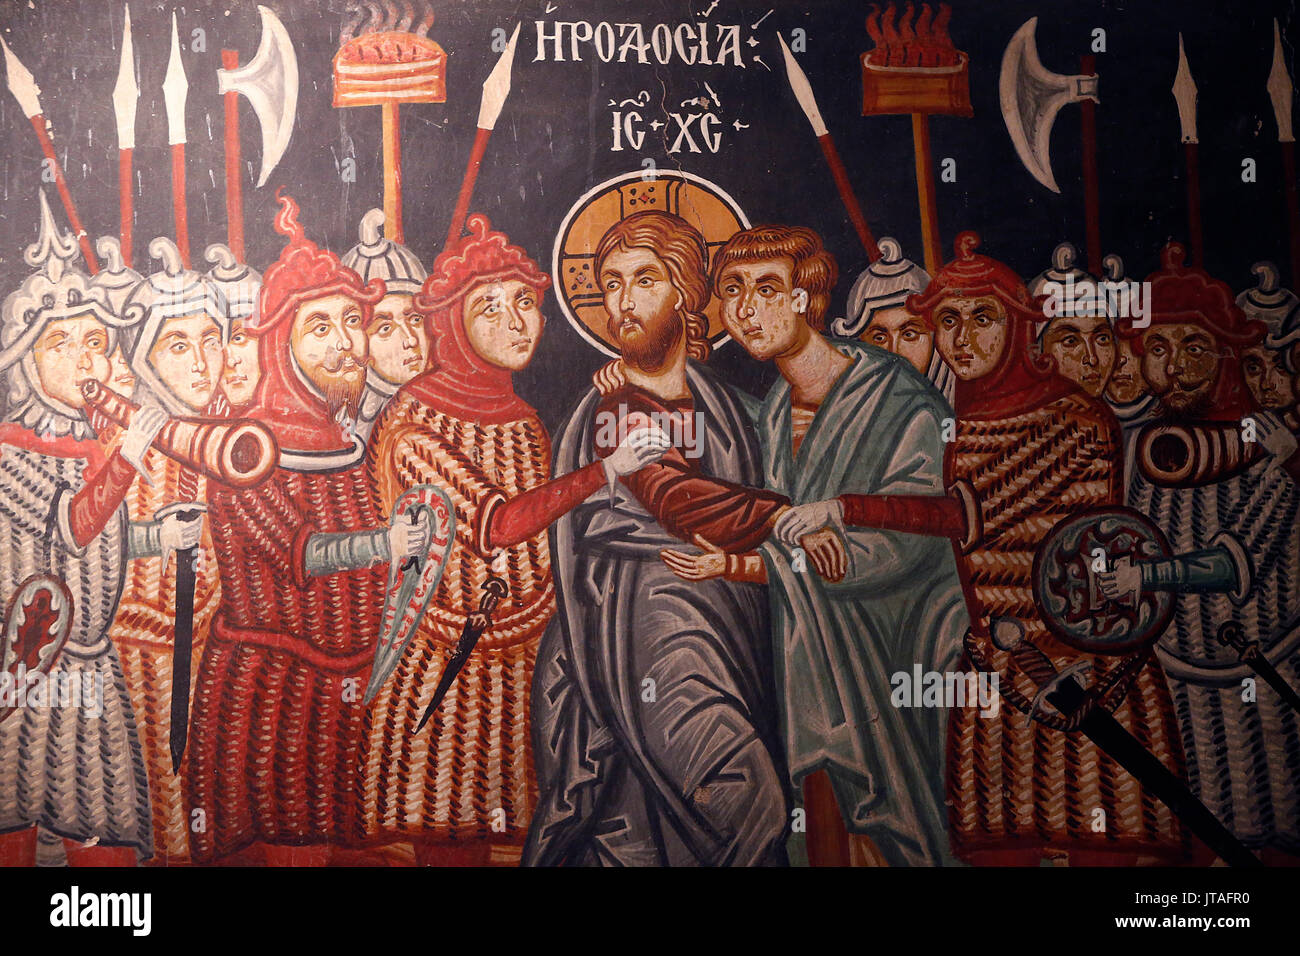 Fresco of Jesus Christ arrested, Church of Archangel Michael, Pedoulas, Cyprus, Europe - Stock Image